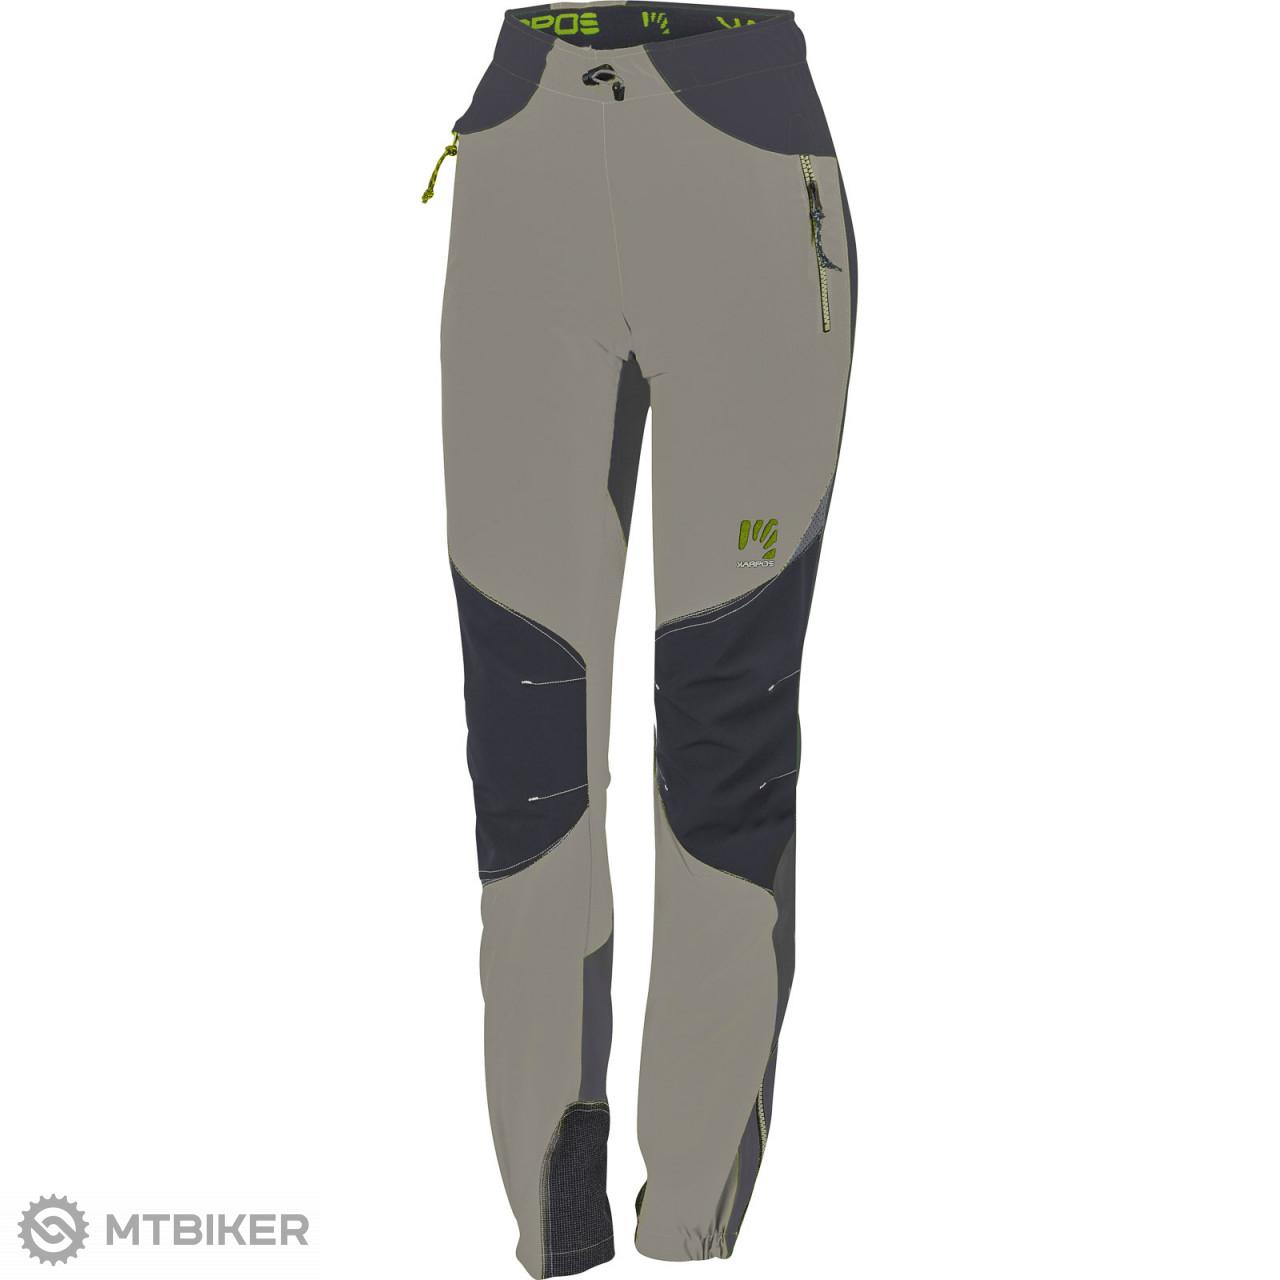 aa35b04502846 Karpos Rock outdoorové nohavice dámske sivé - MTBIKER Shop